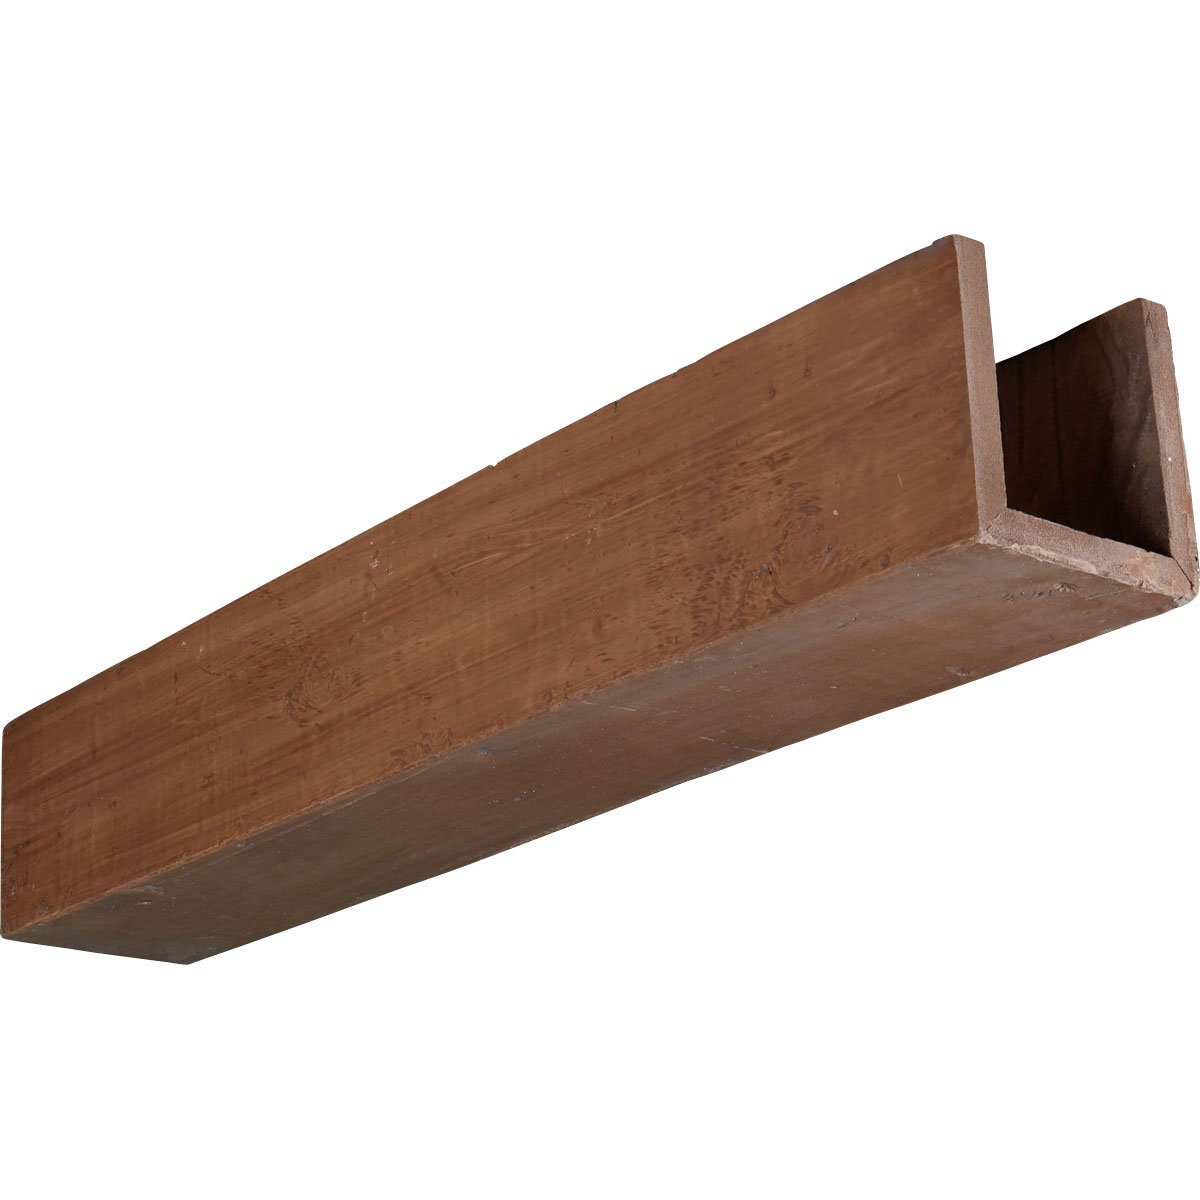 Ekena Millwork BMKP3C0080X040X144PE 8''W x 4''H x 12'L 3-Sided (U-beam) Knotty Pine Endurathane Faux Wood Ceiling Beam, Pecan